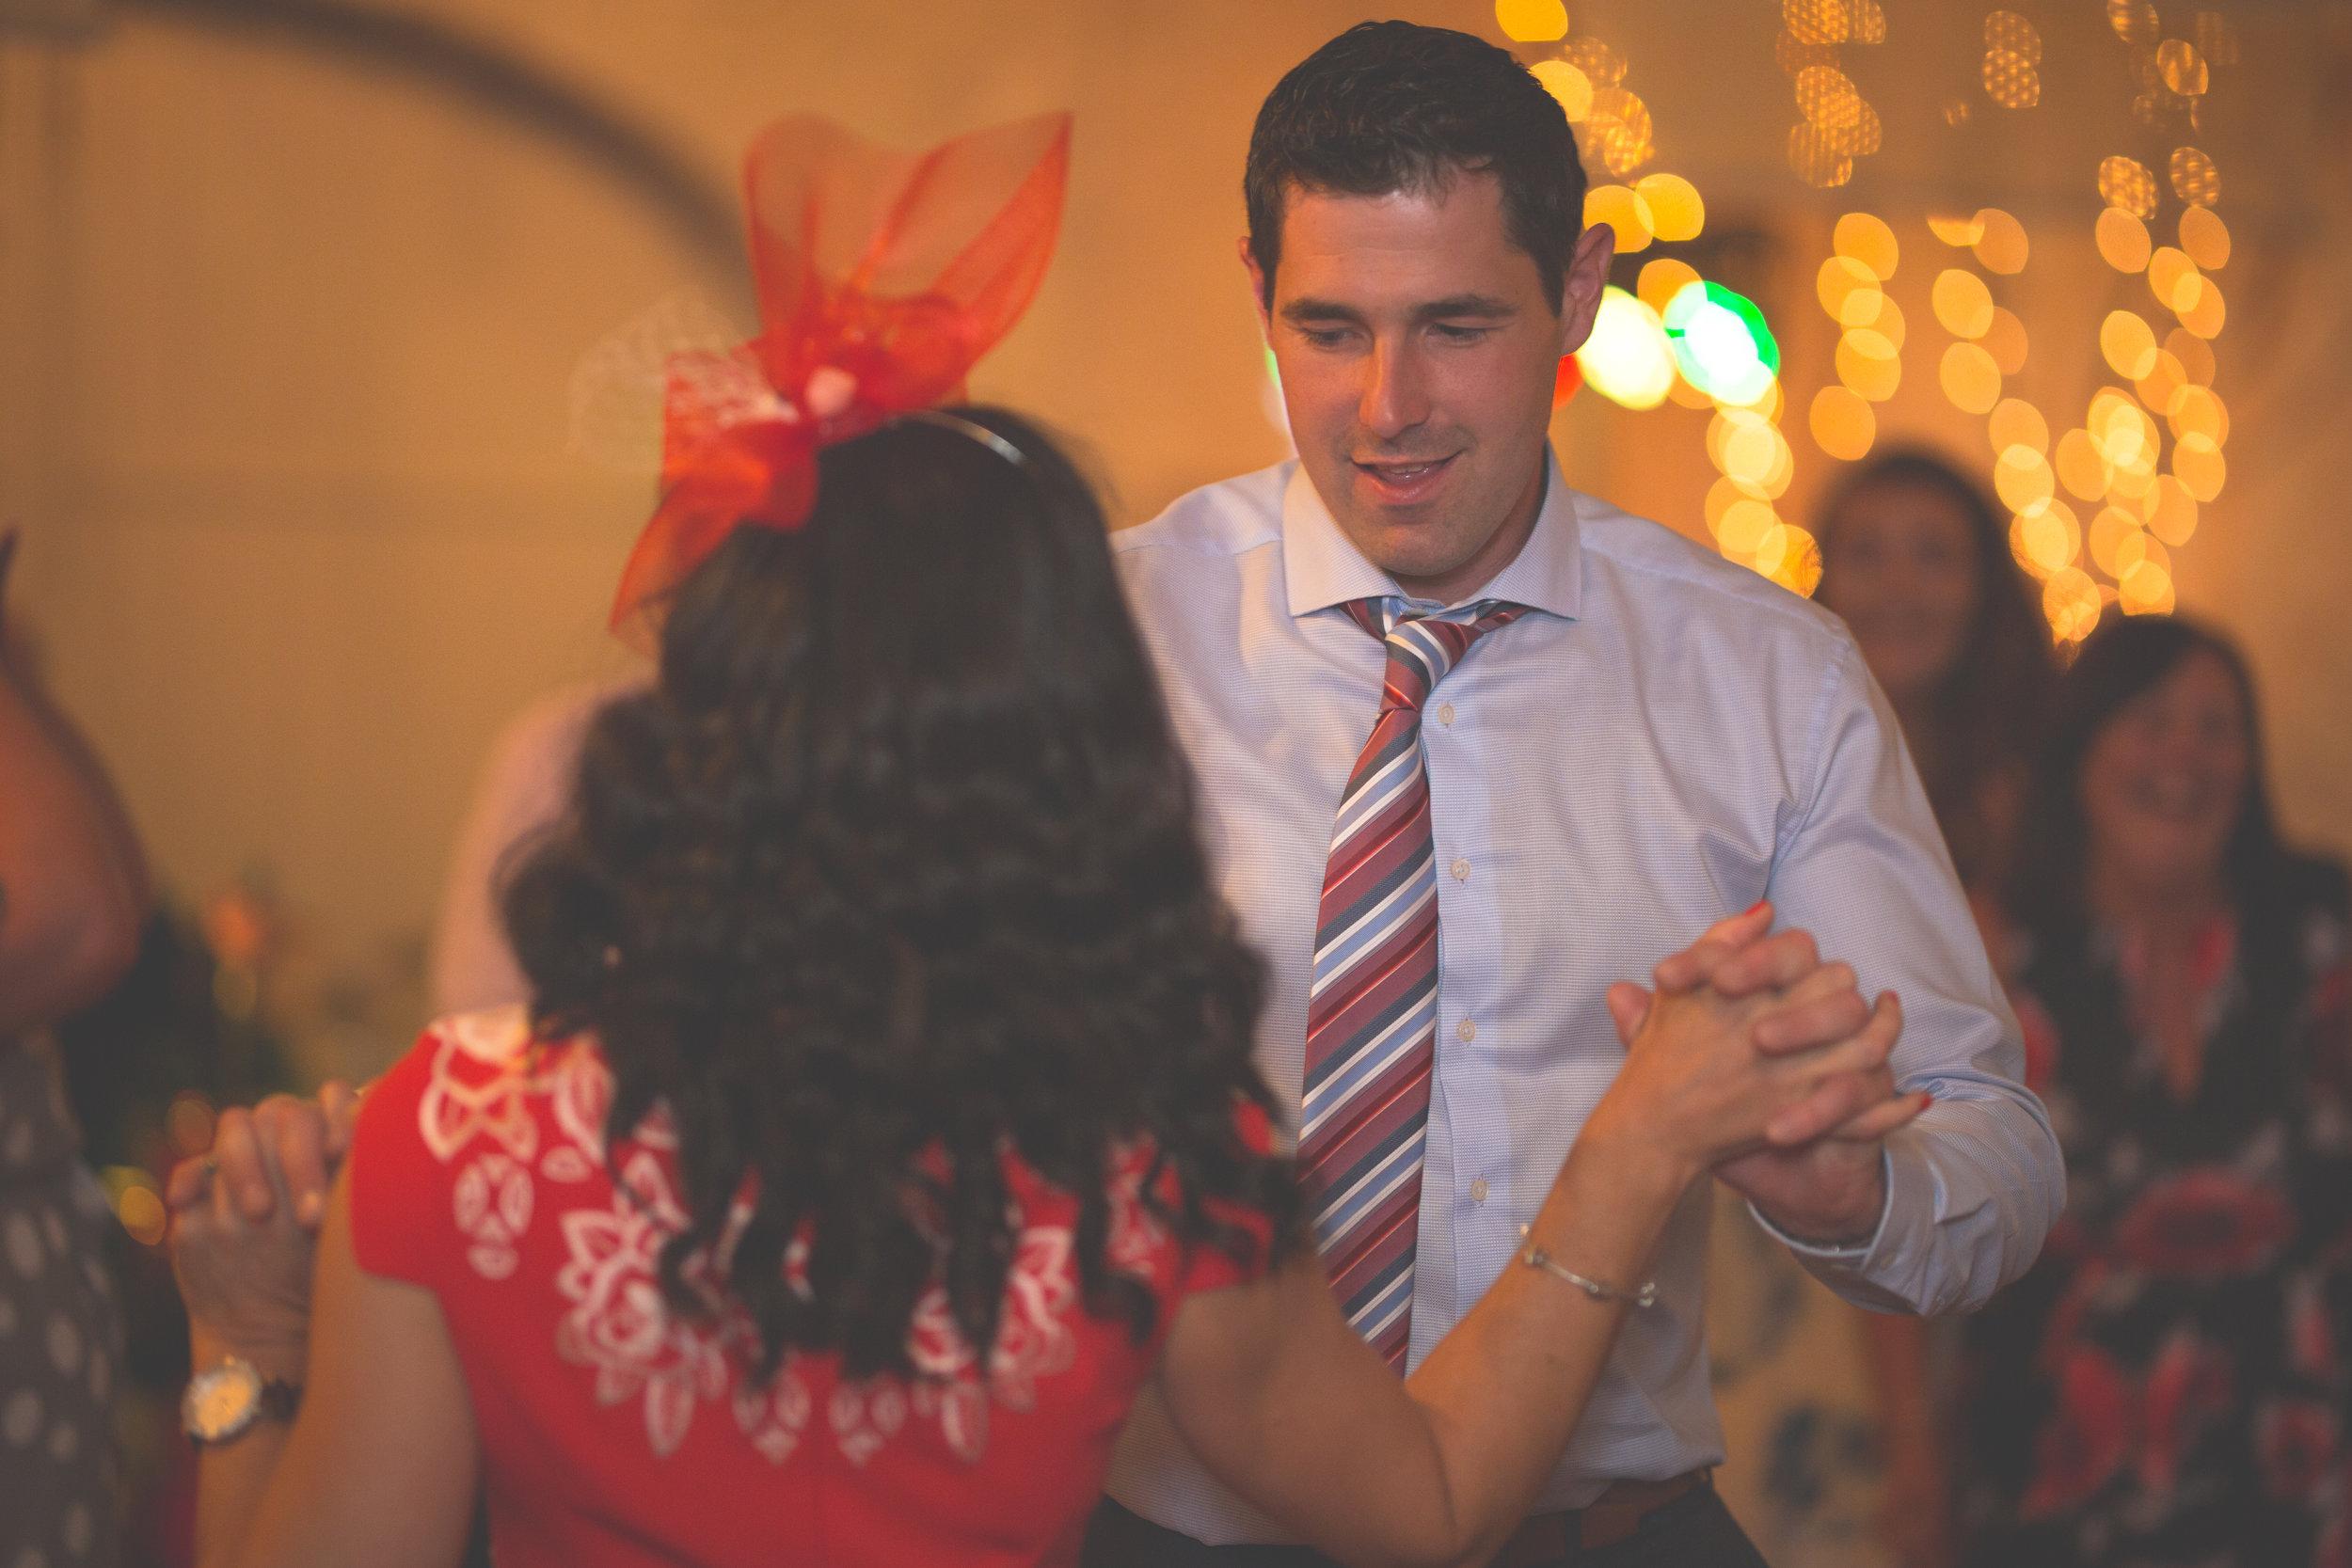 Brian McEwan Wedding Photography | Carol-Annee & Sean | The Dancing-80.jpg